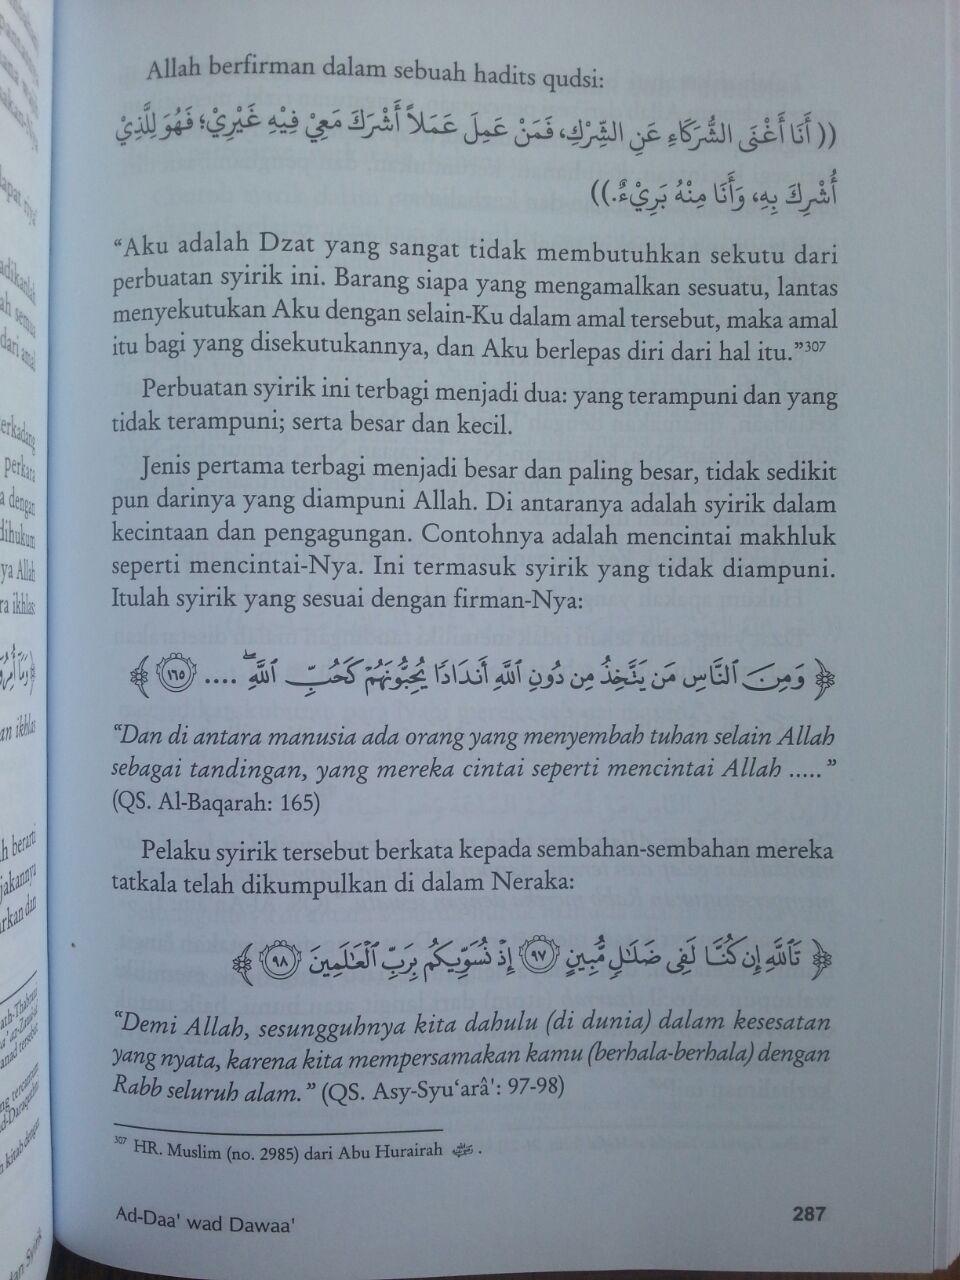 Buku Pengobatan Ad-Daa' wa ad-Dawaa' isi 4